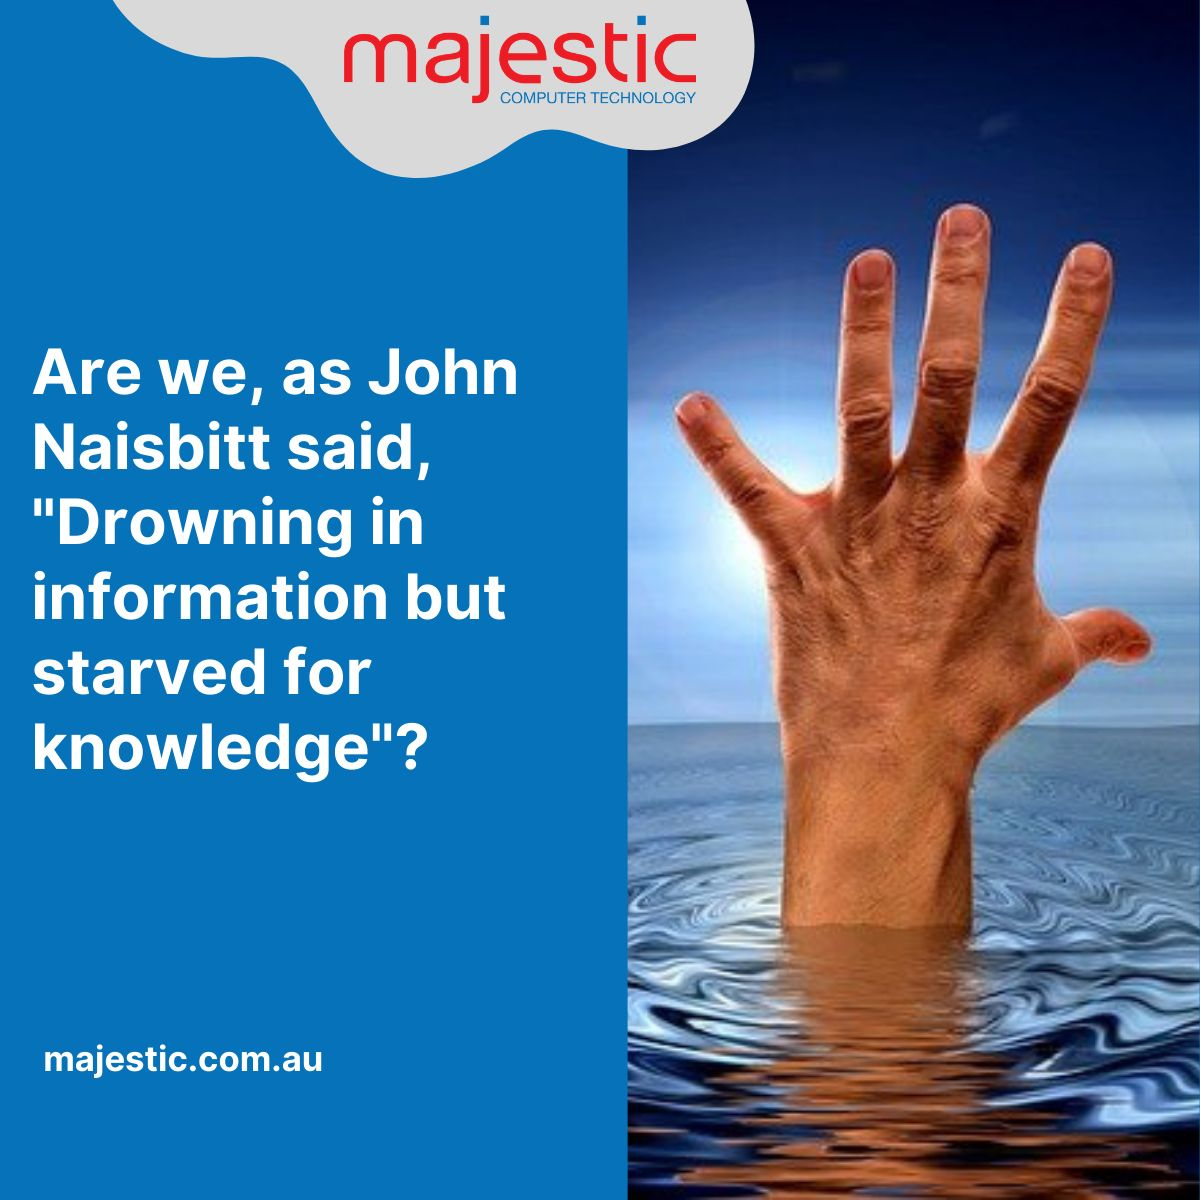 Jhon Naisbit's quote